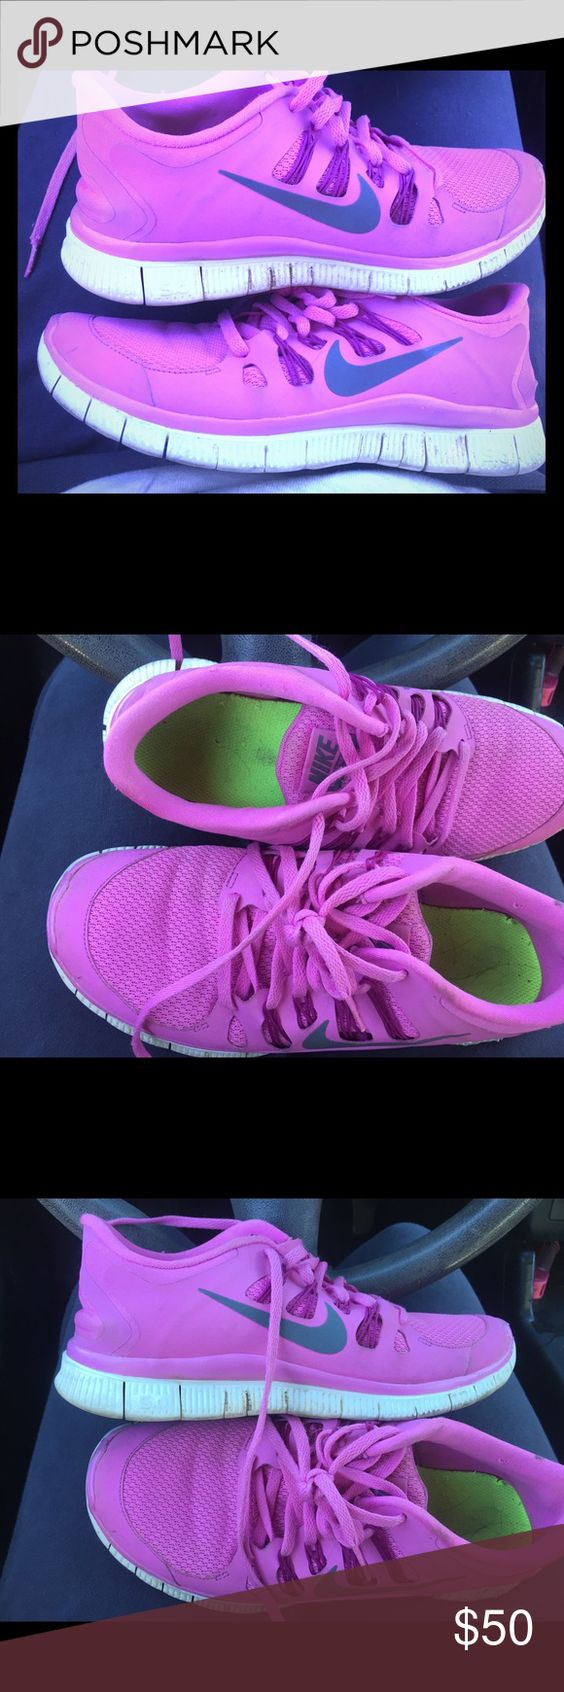 custom color nike shoes